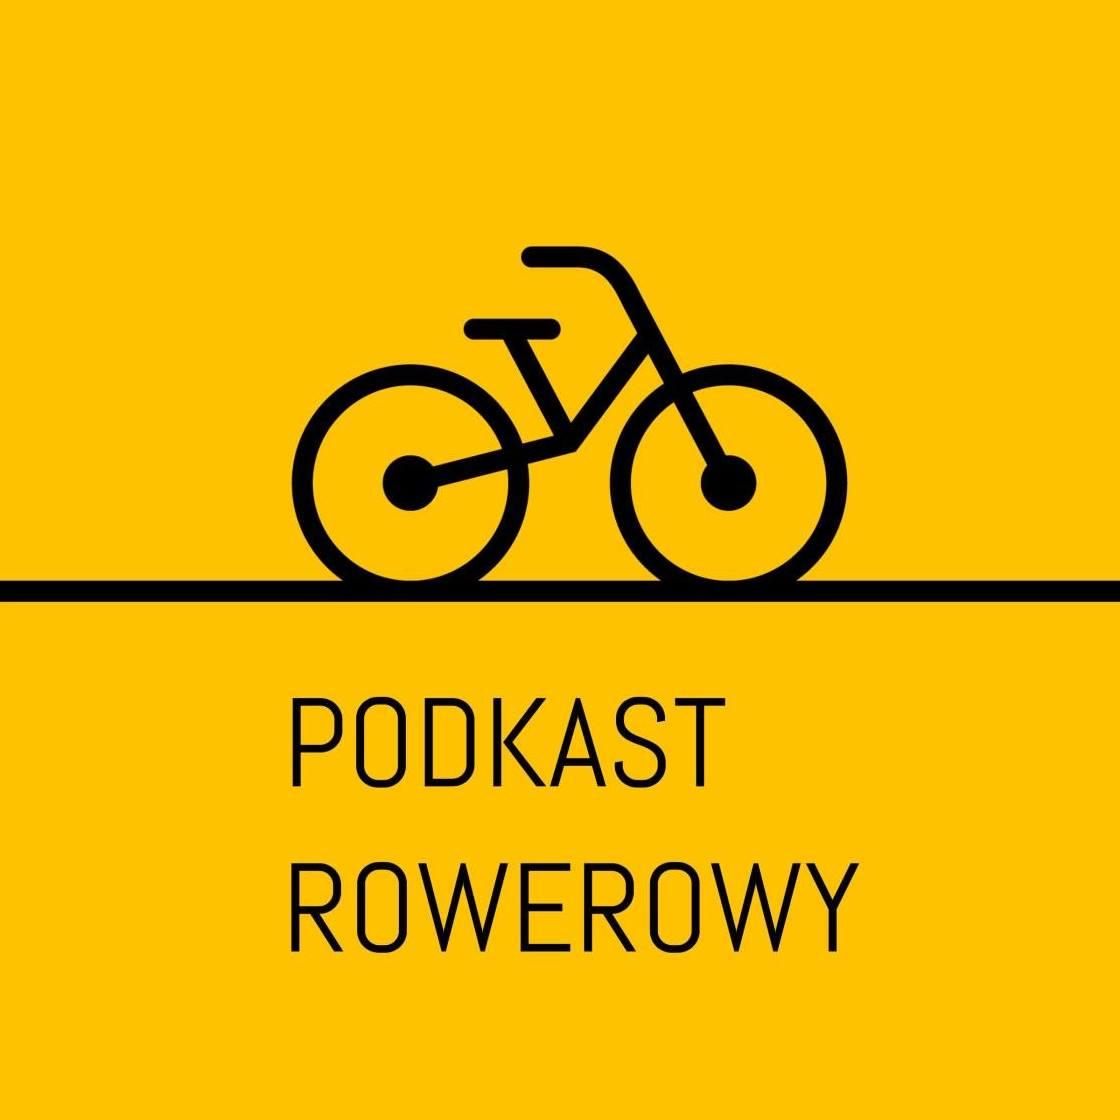 Podcast Rowerowy